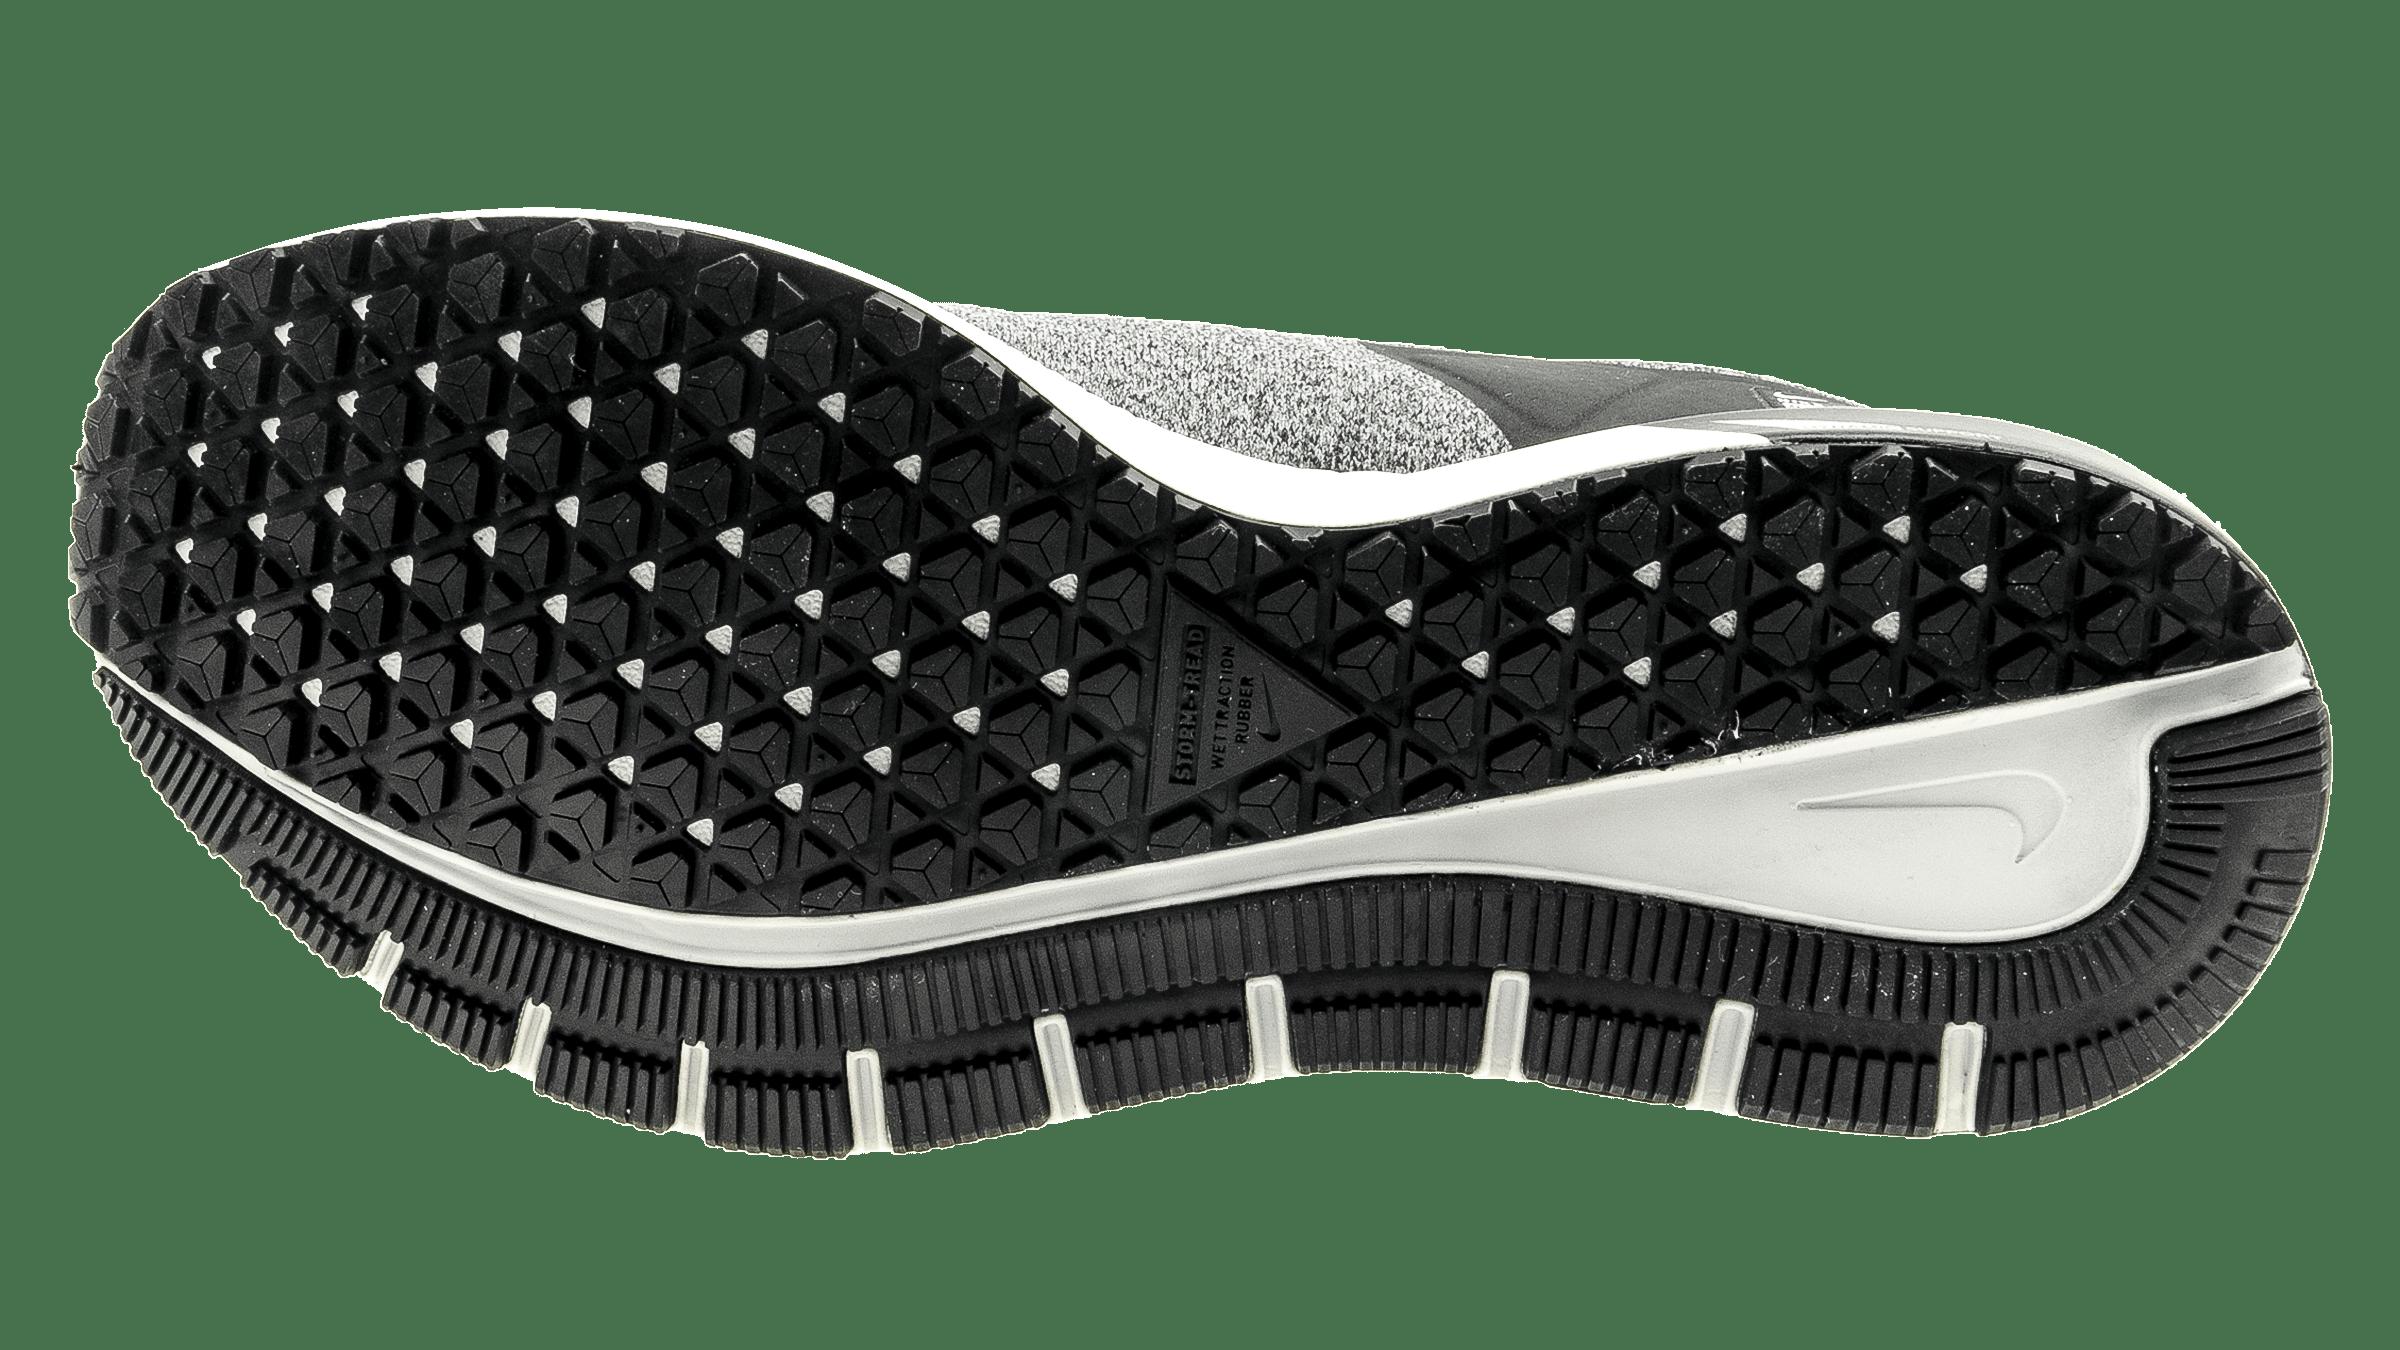 f8afd7e7193b3 Nike Air Zoom Structure 22 SHIELD black white cool grey bestellen ...